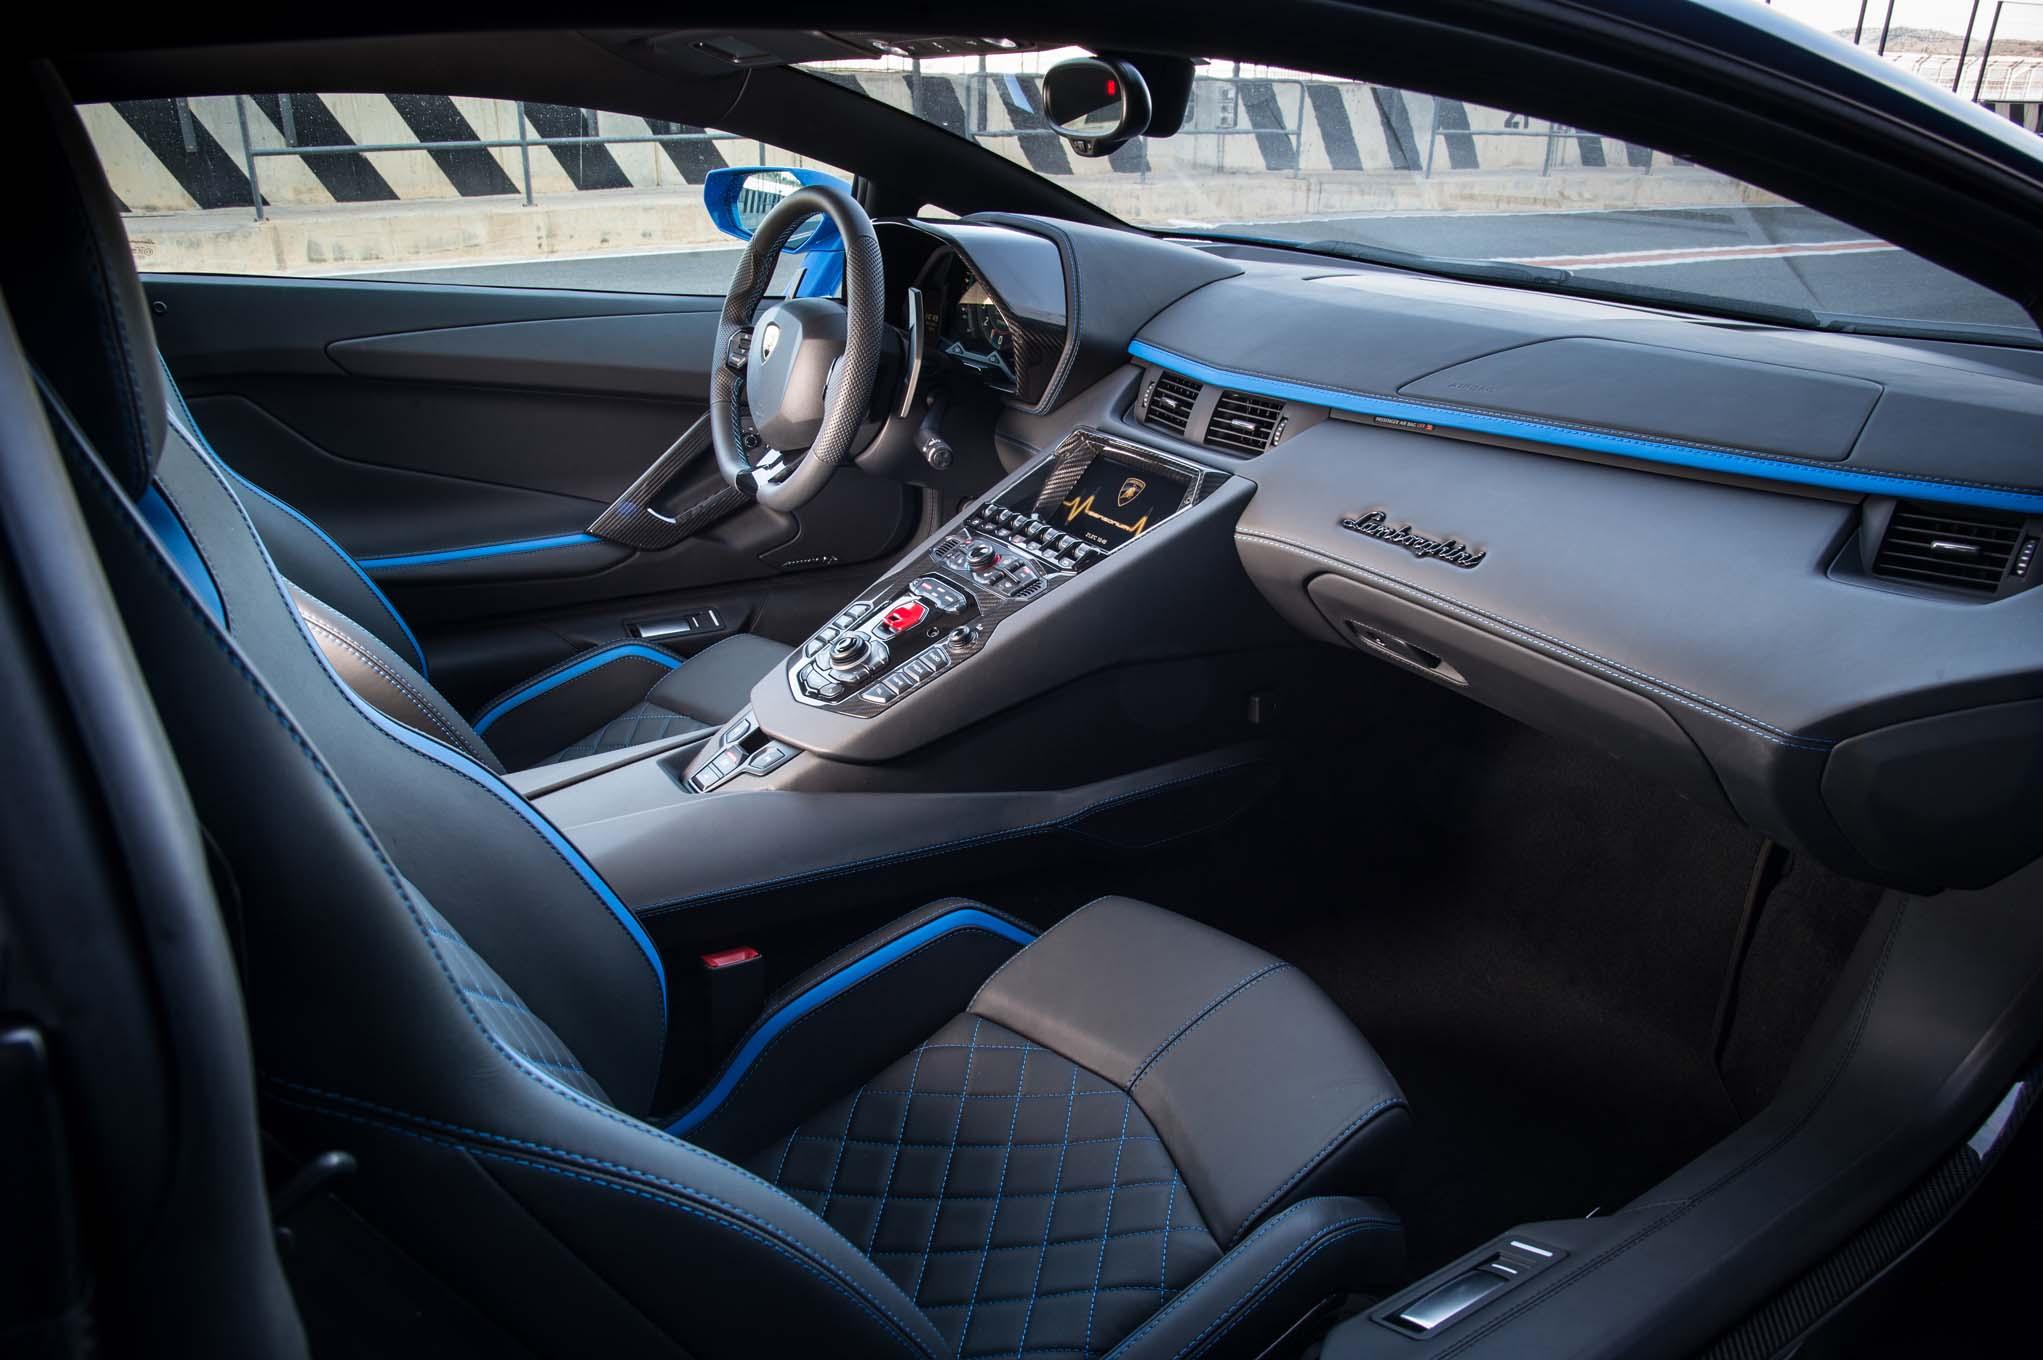 2018 Lamborghini Aventador S Interior Motor Trend En Espanol